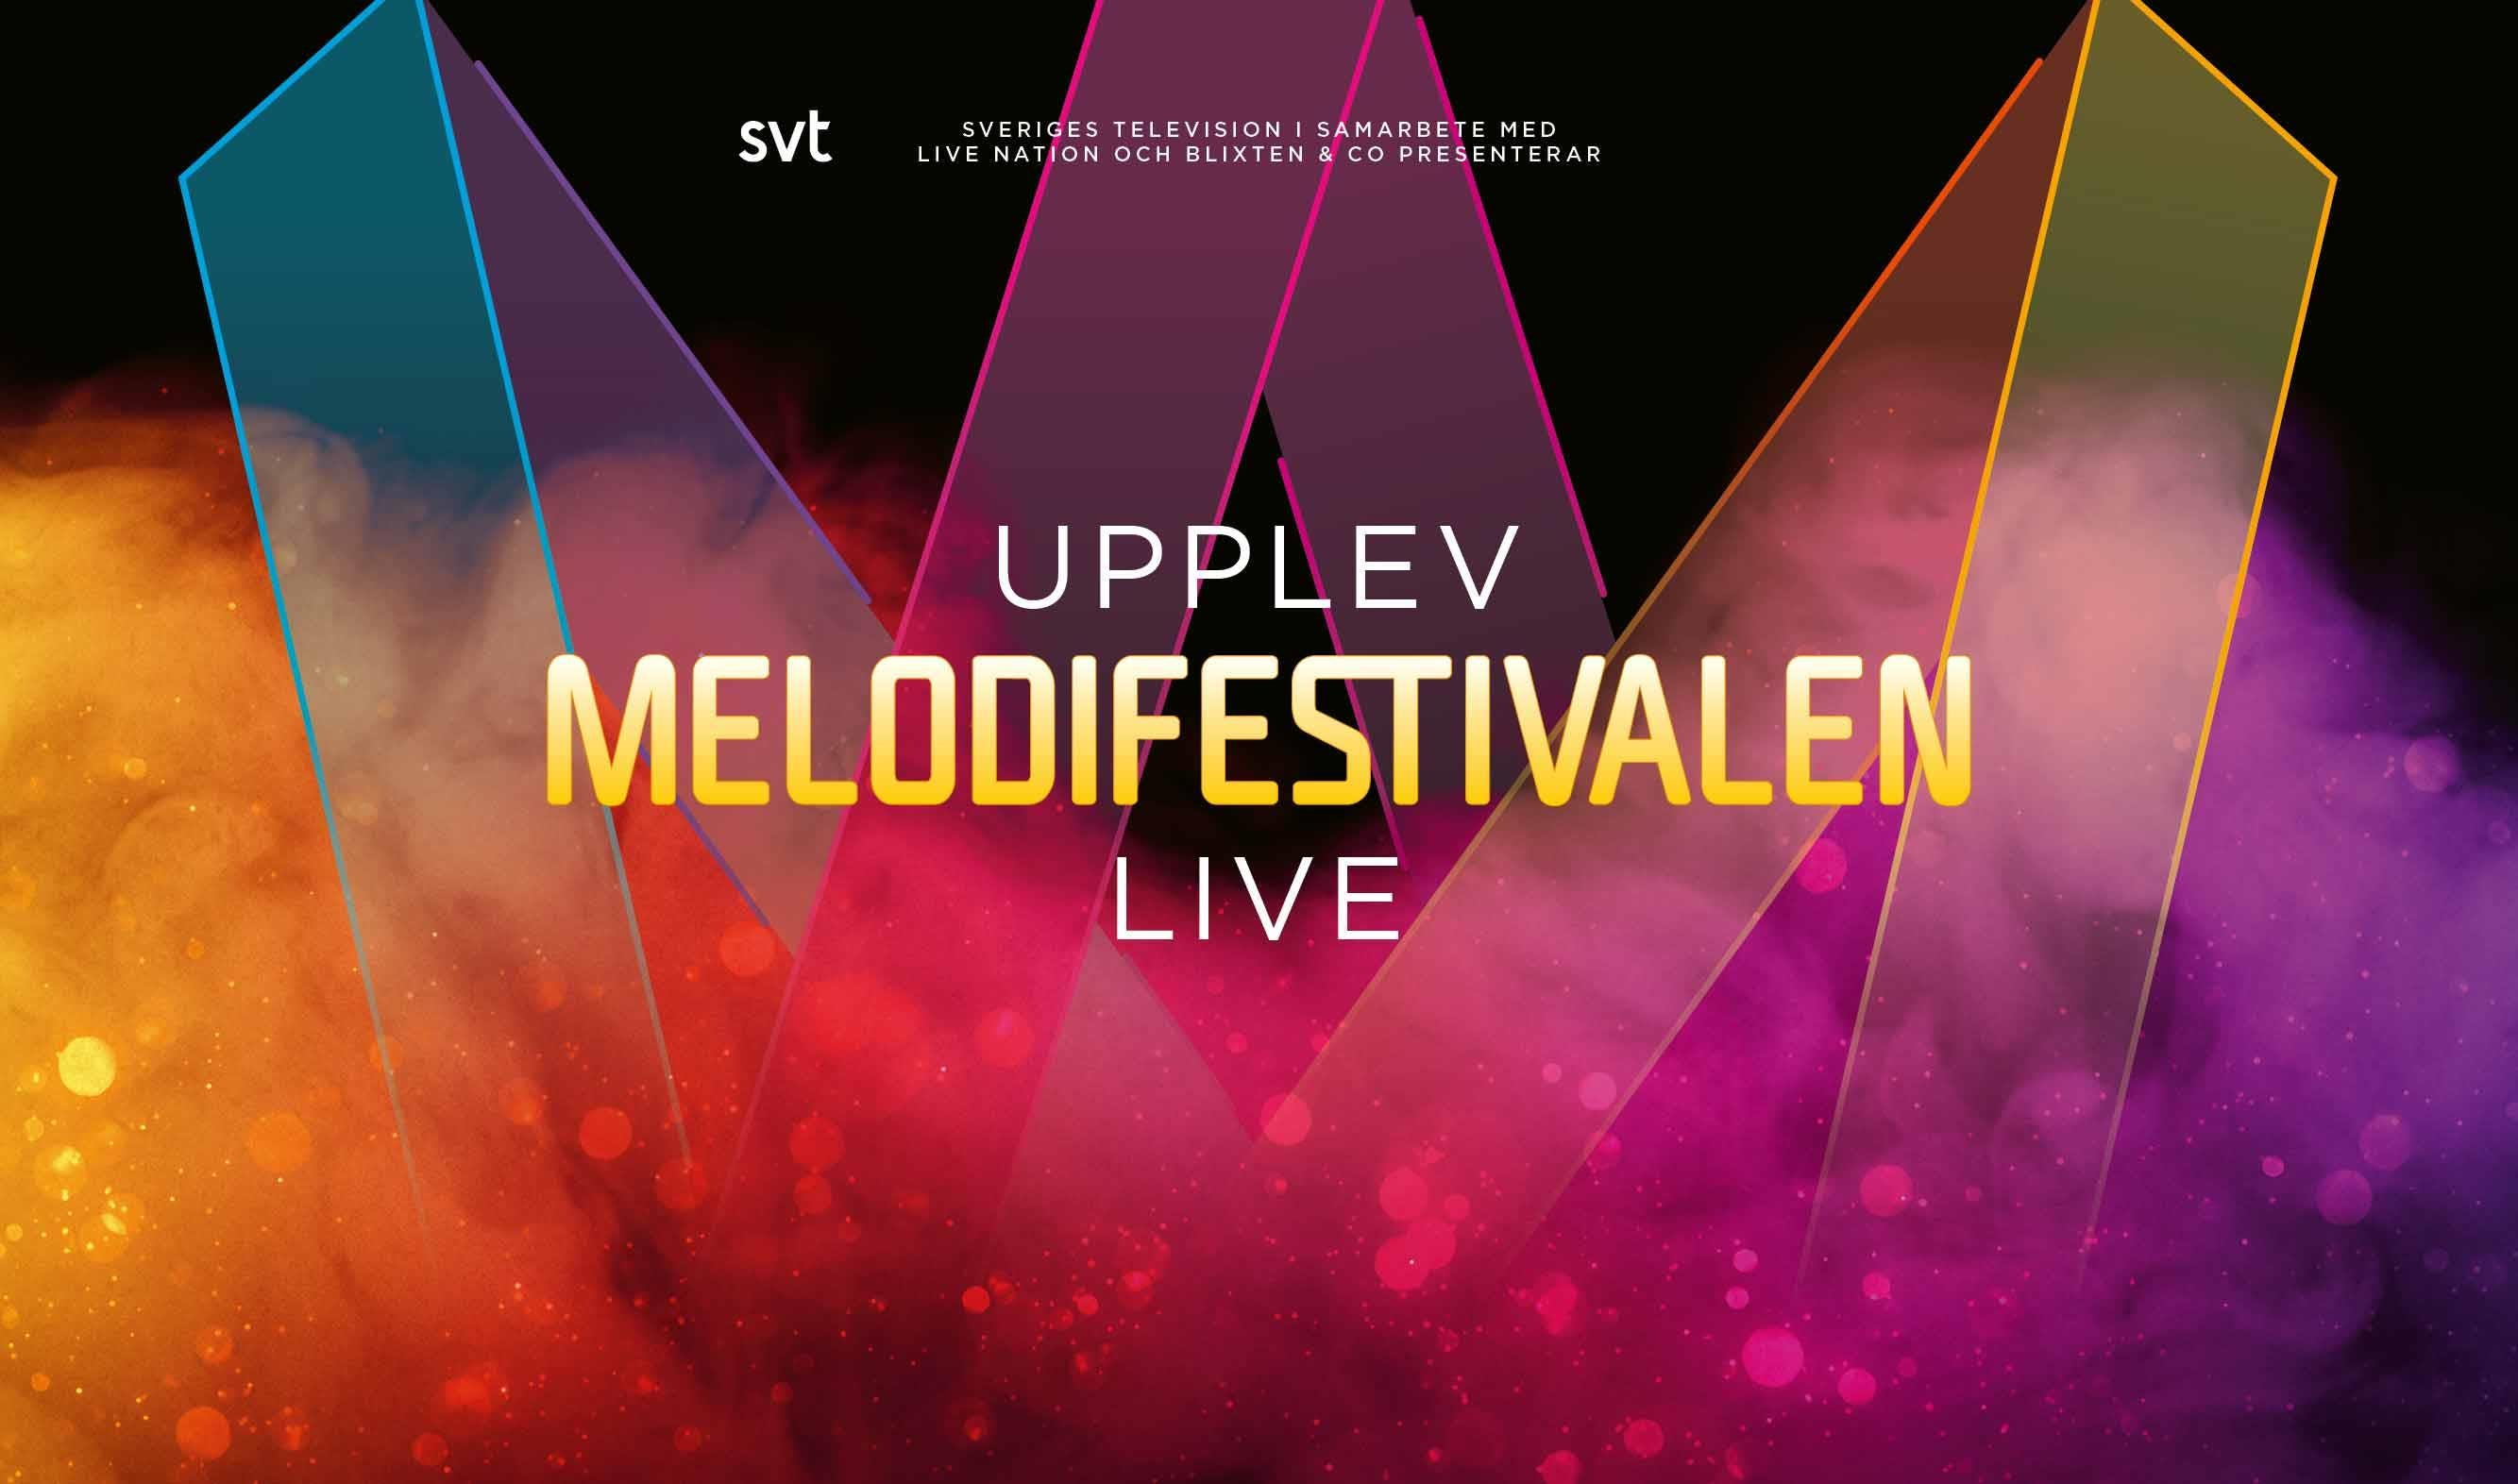 Melodifestivalen 2019 Deltävling 2: Melodifestivalen 2019 Tickets